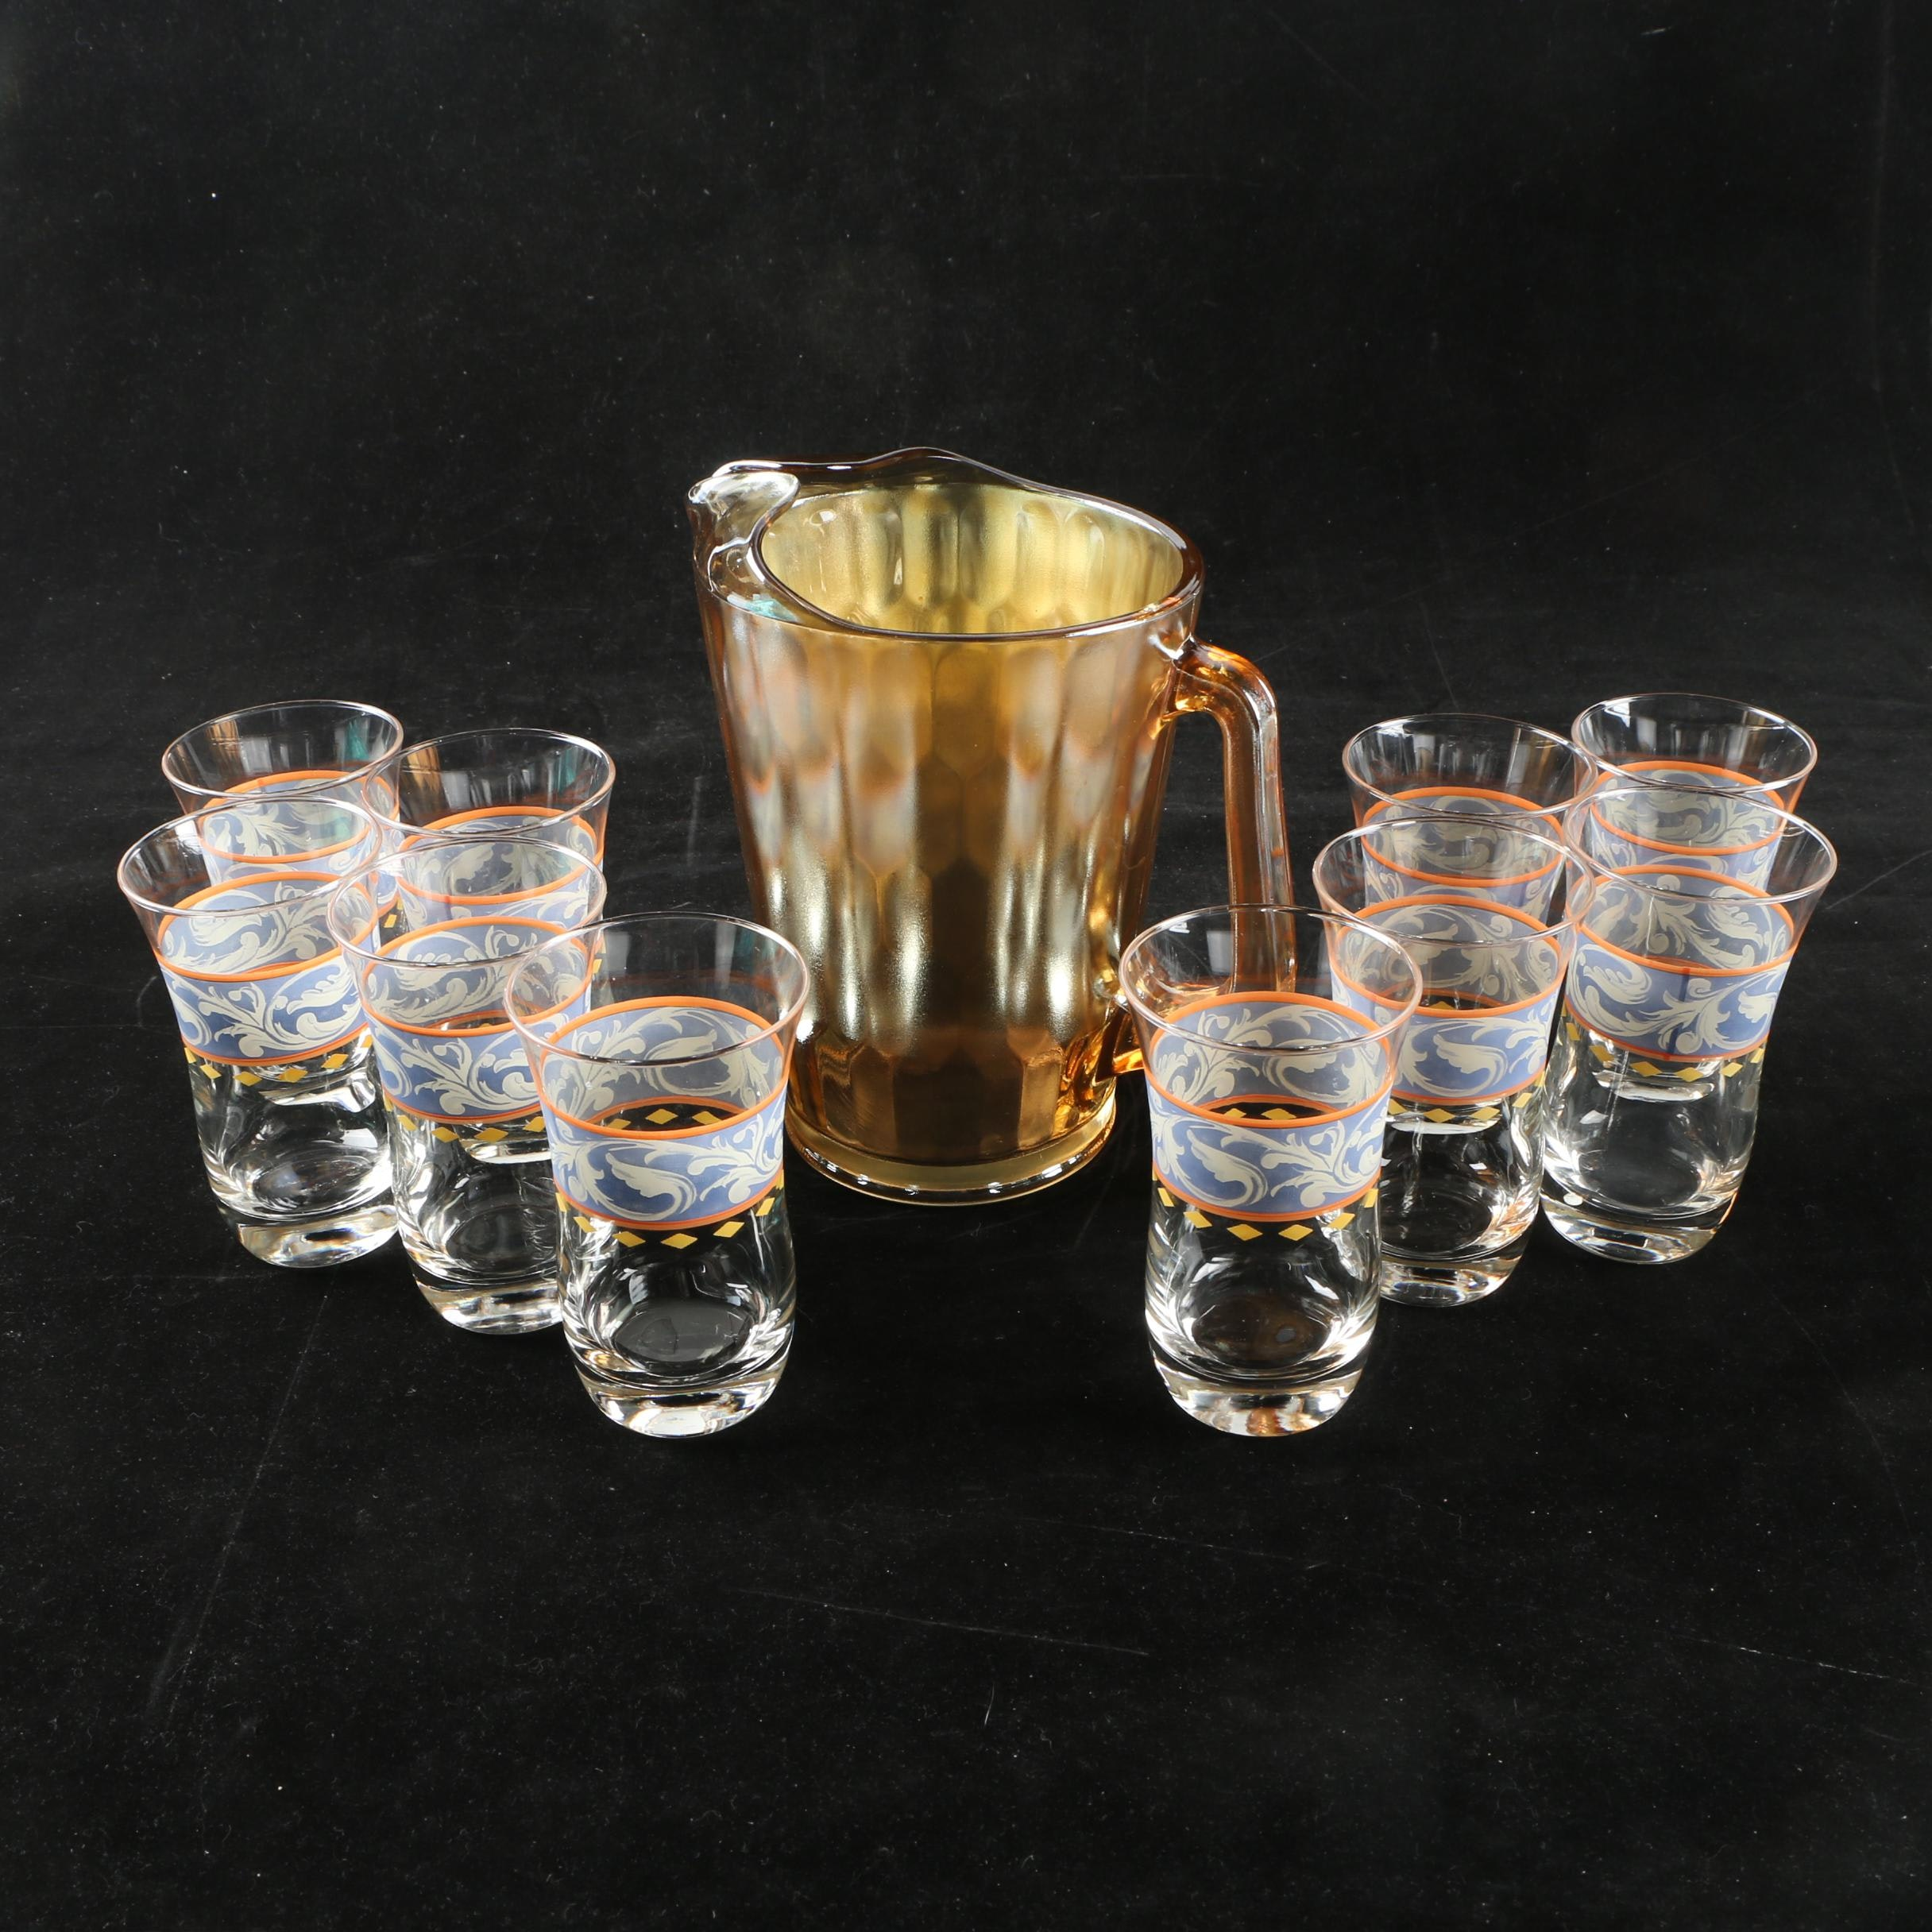 Amber Carnival Glass Pitcher and Foliate Motif Tumblers